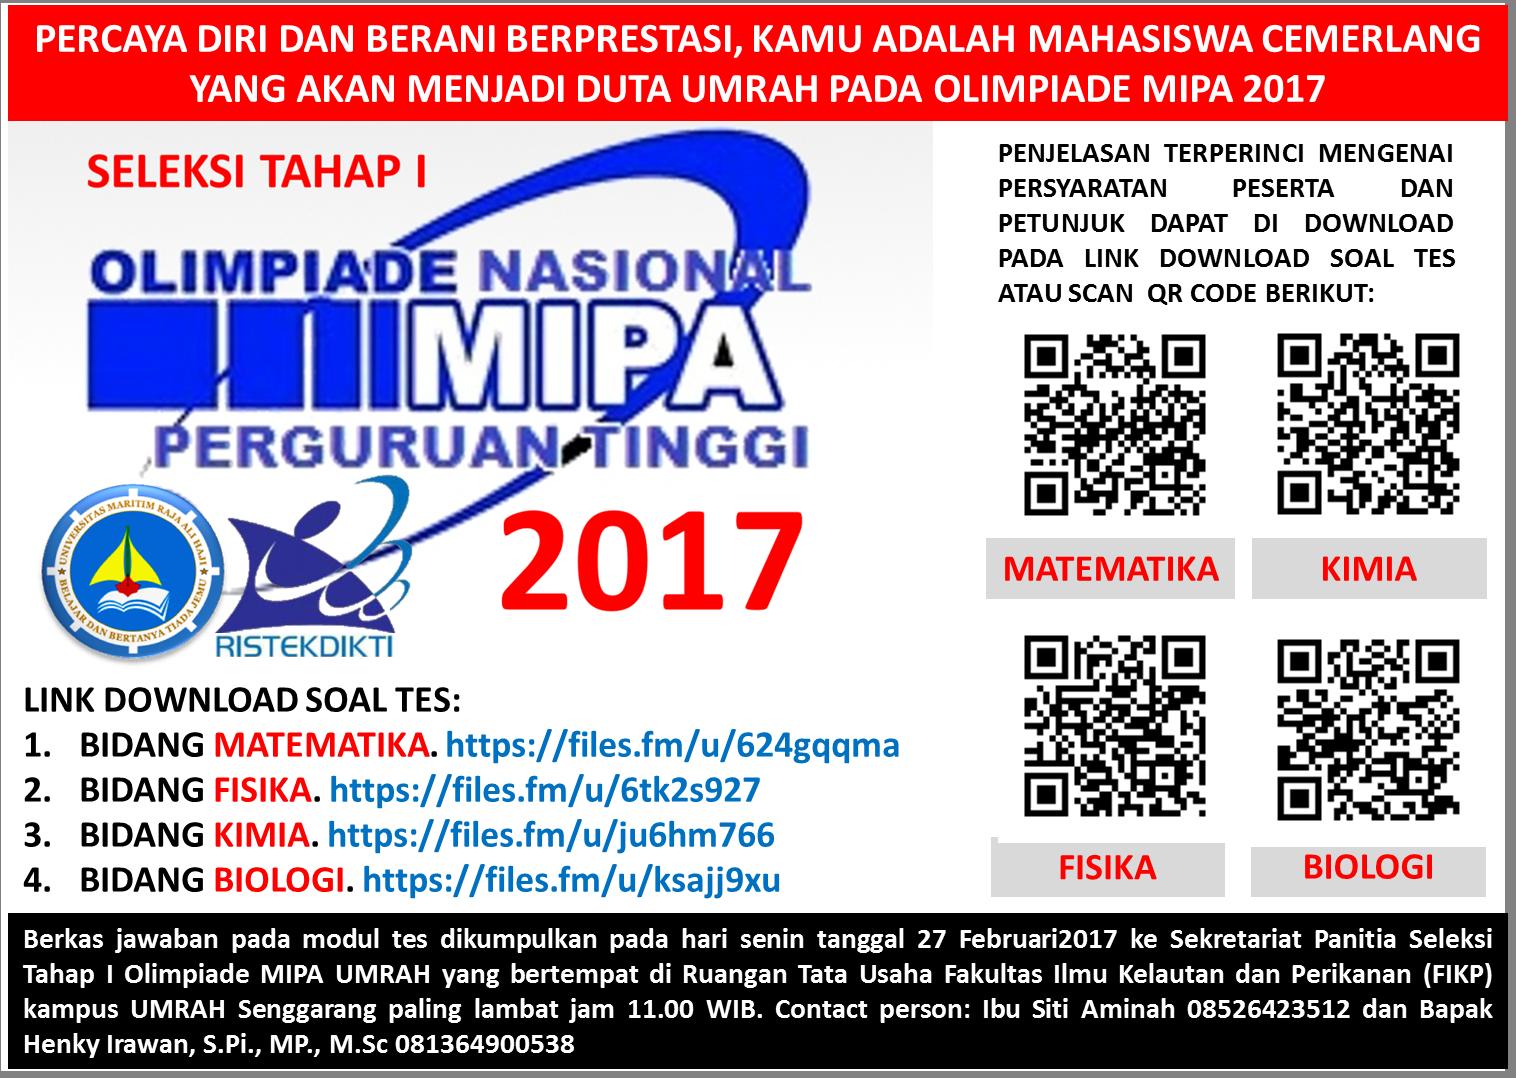 SELEKSI TAHAP I OLIMPIADE MIPA 2017